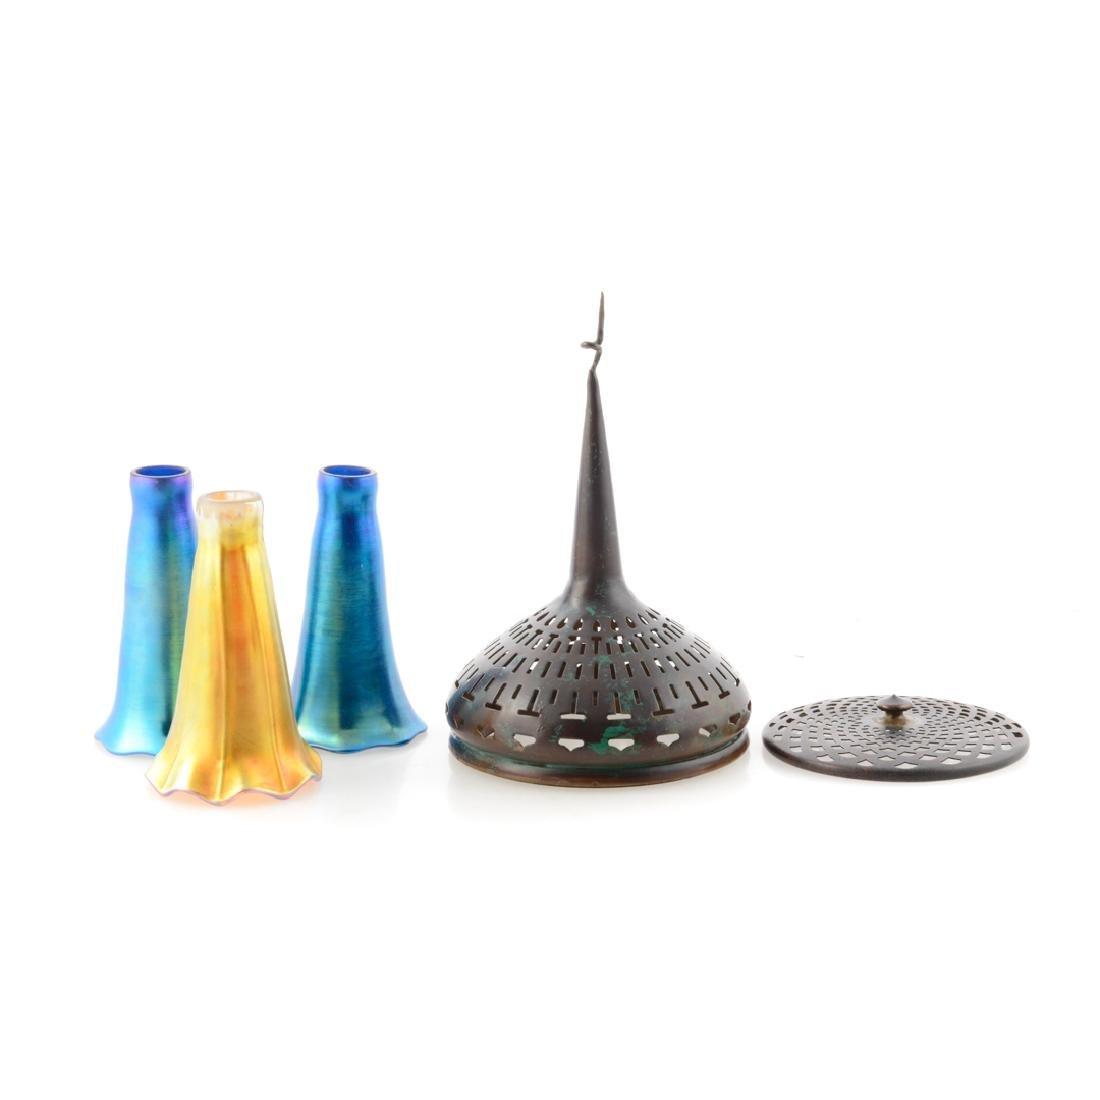 Five Tiffany attributed lamp parts & shades